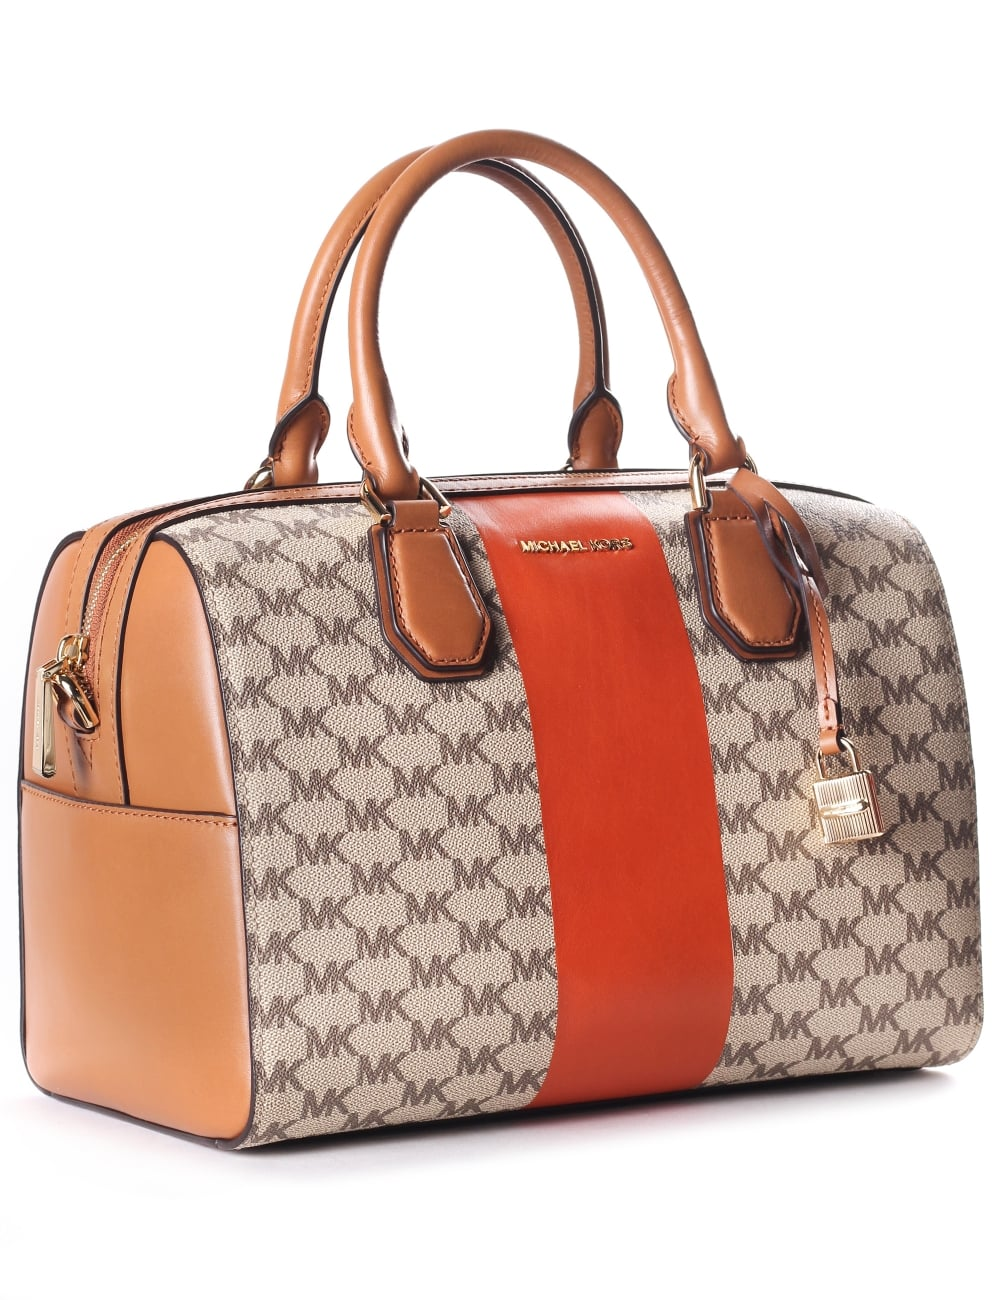 0a235dc72f9f Michael Kors Women s Centre Stripe Mercer Large Convertible Tote Bag